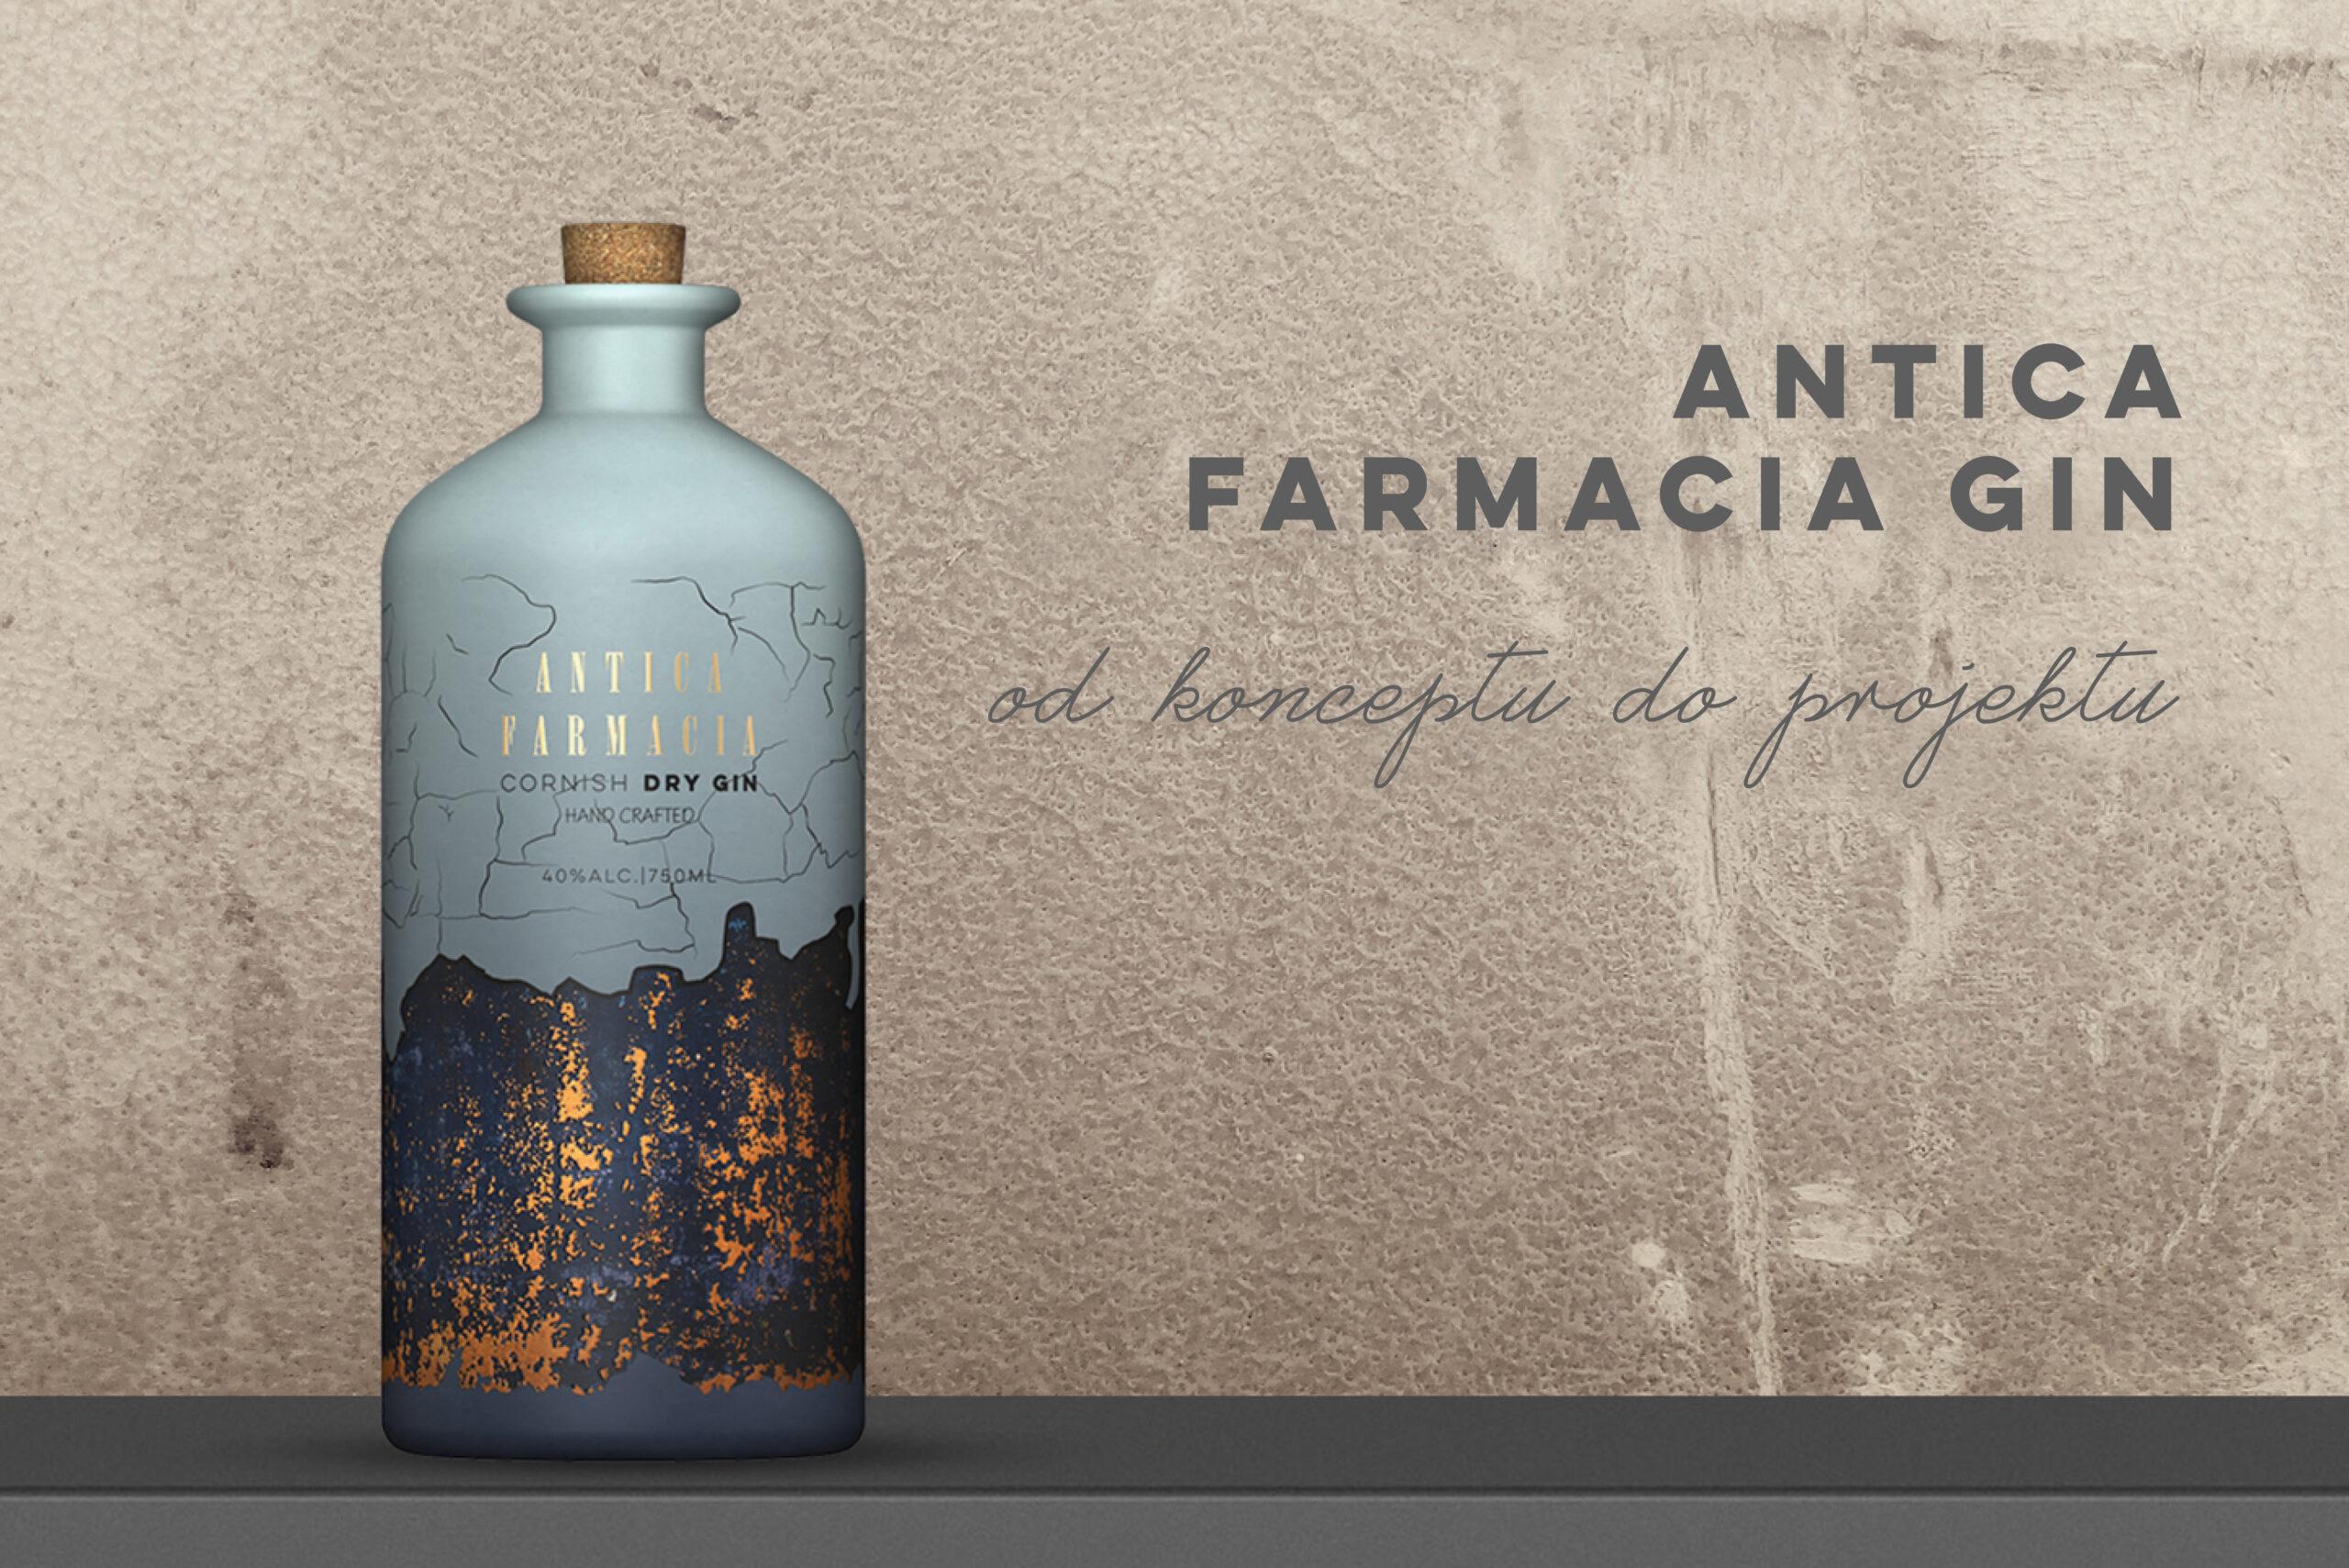 Antica Farmacia Gin